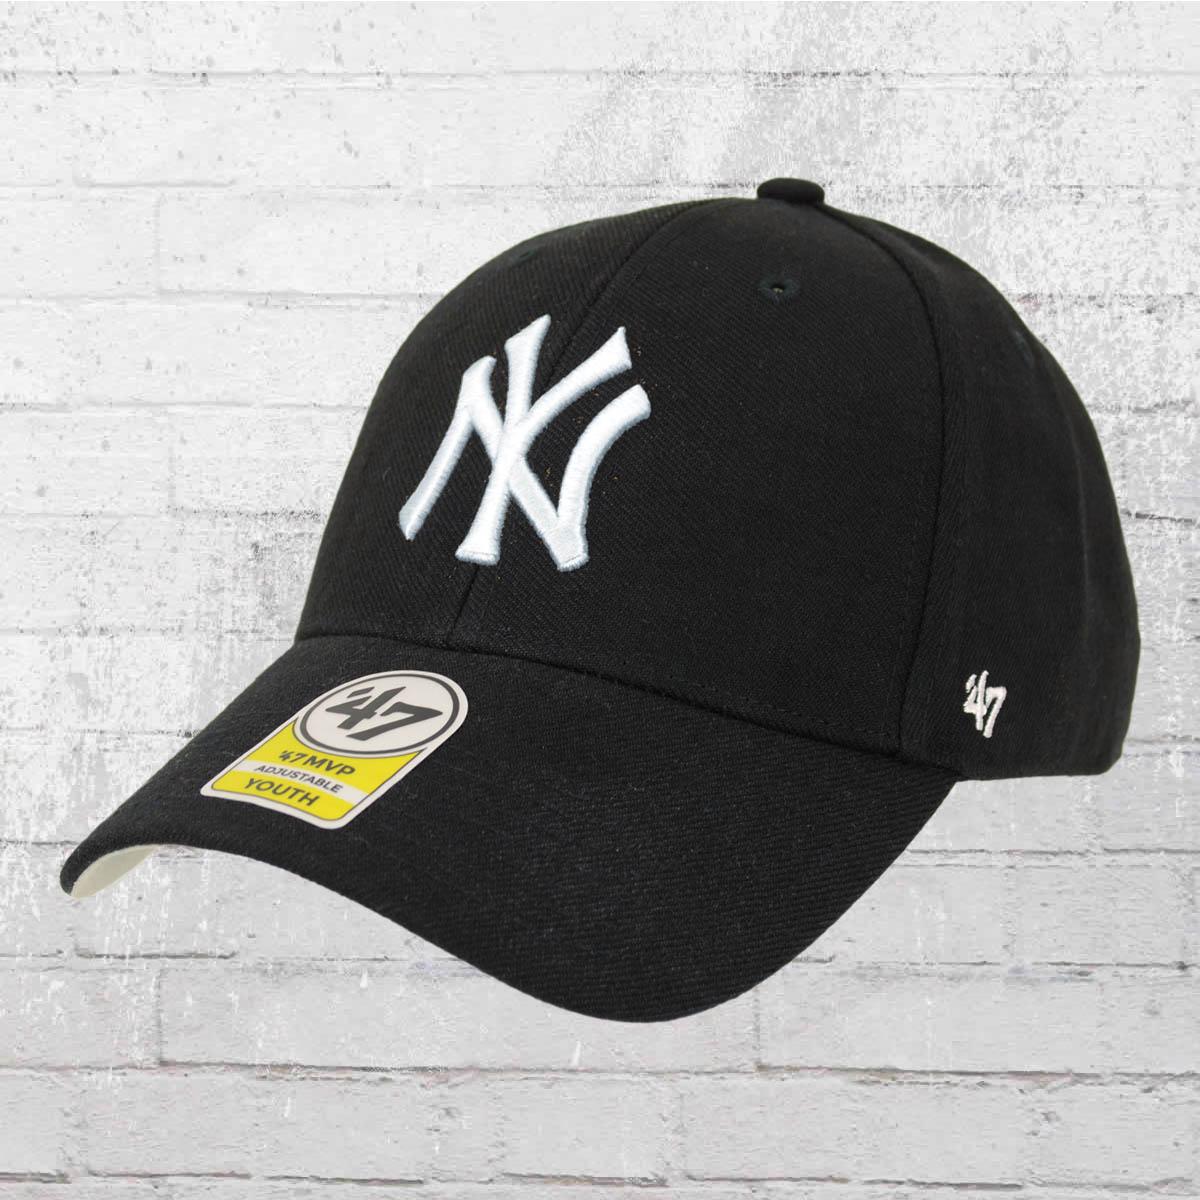 22873082c Order now | 47 Brand Kids MLB Team Hat NY Yankees Cap black